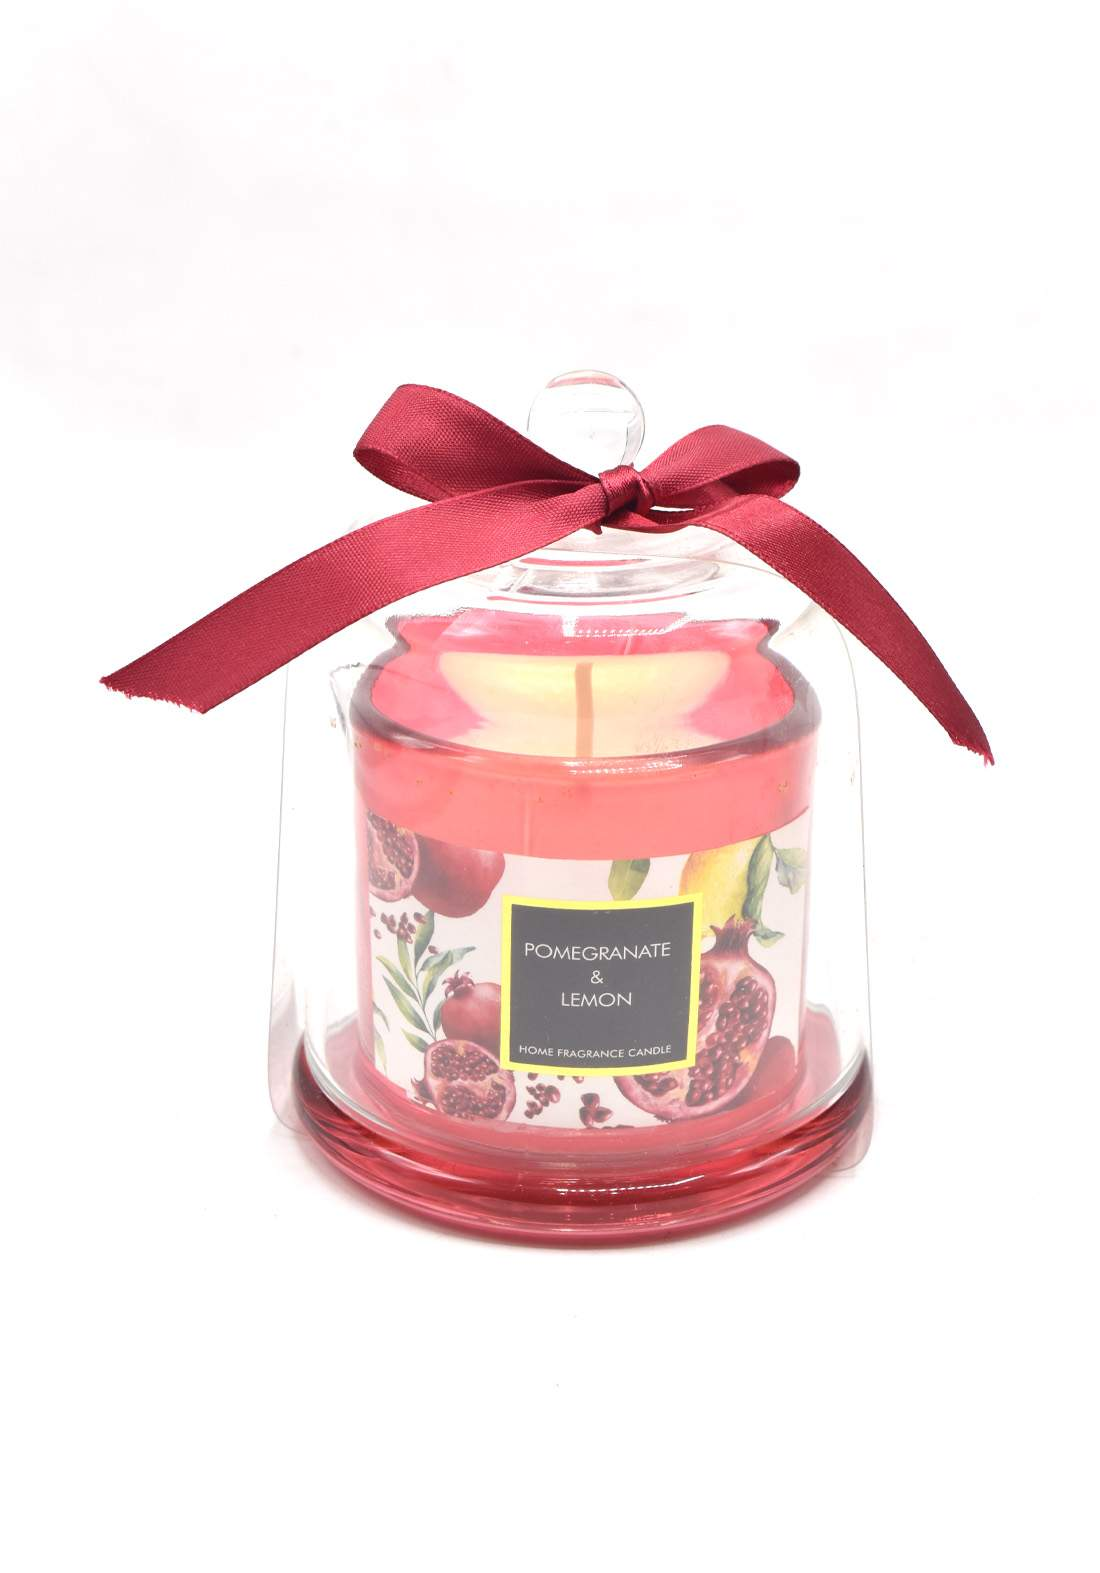 Home Fragrance Candle Pomegranate and Lemon شمعة عطرية عطر الليمون ورمان